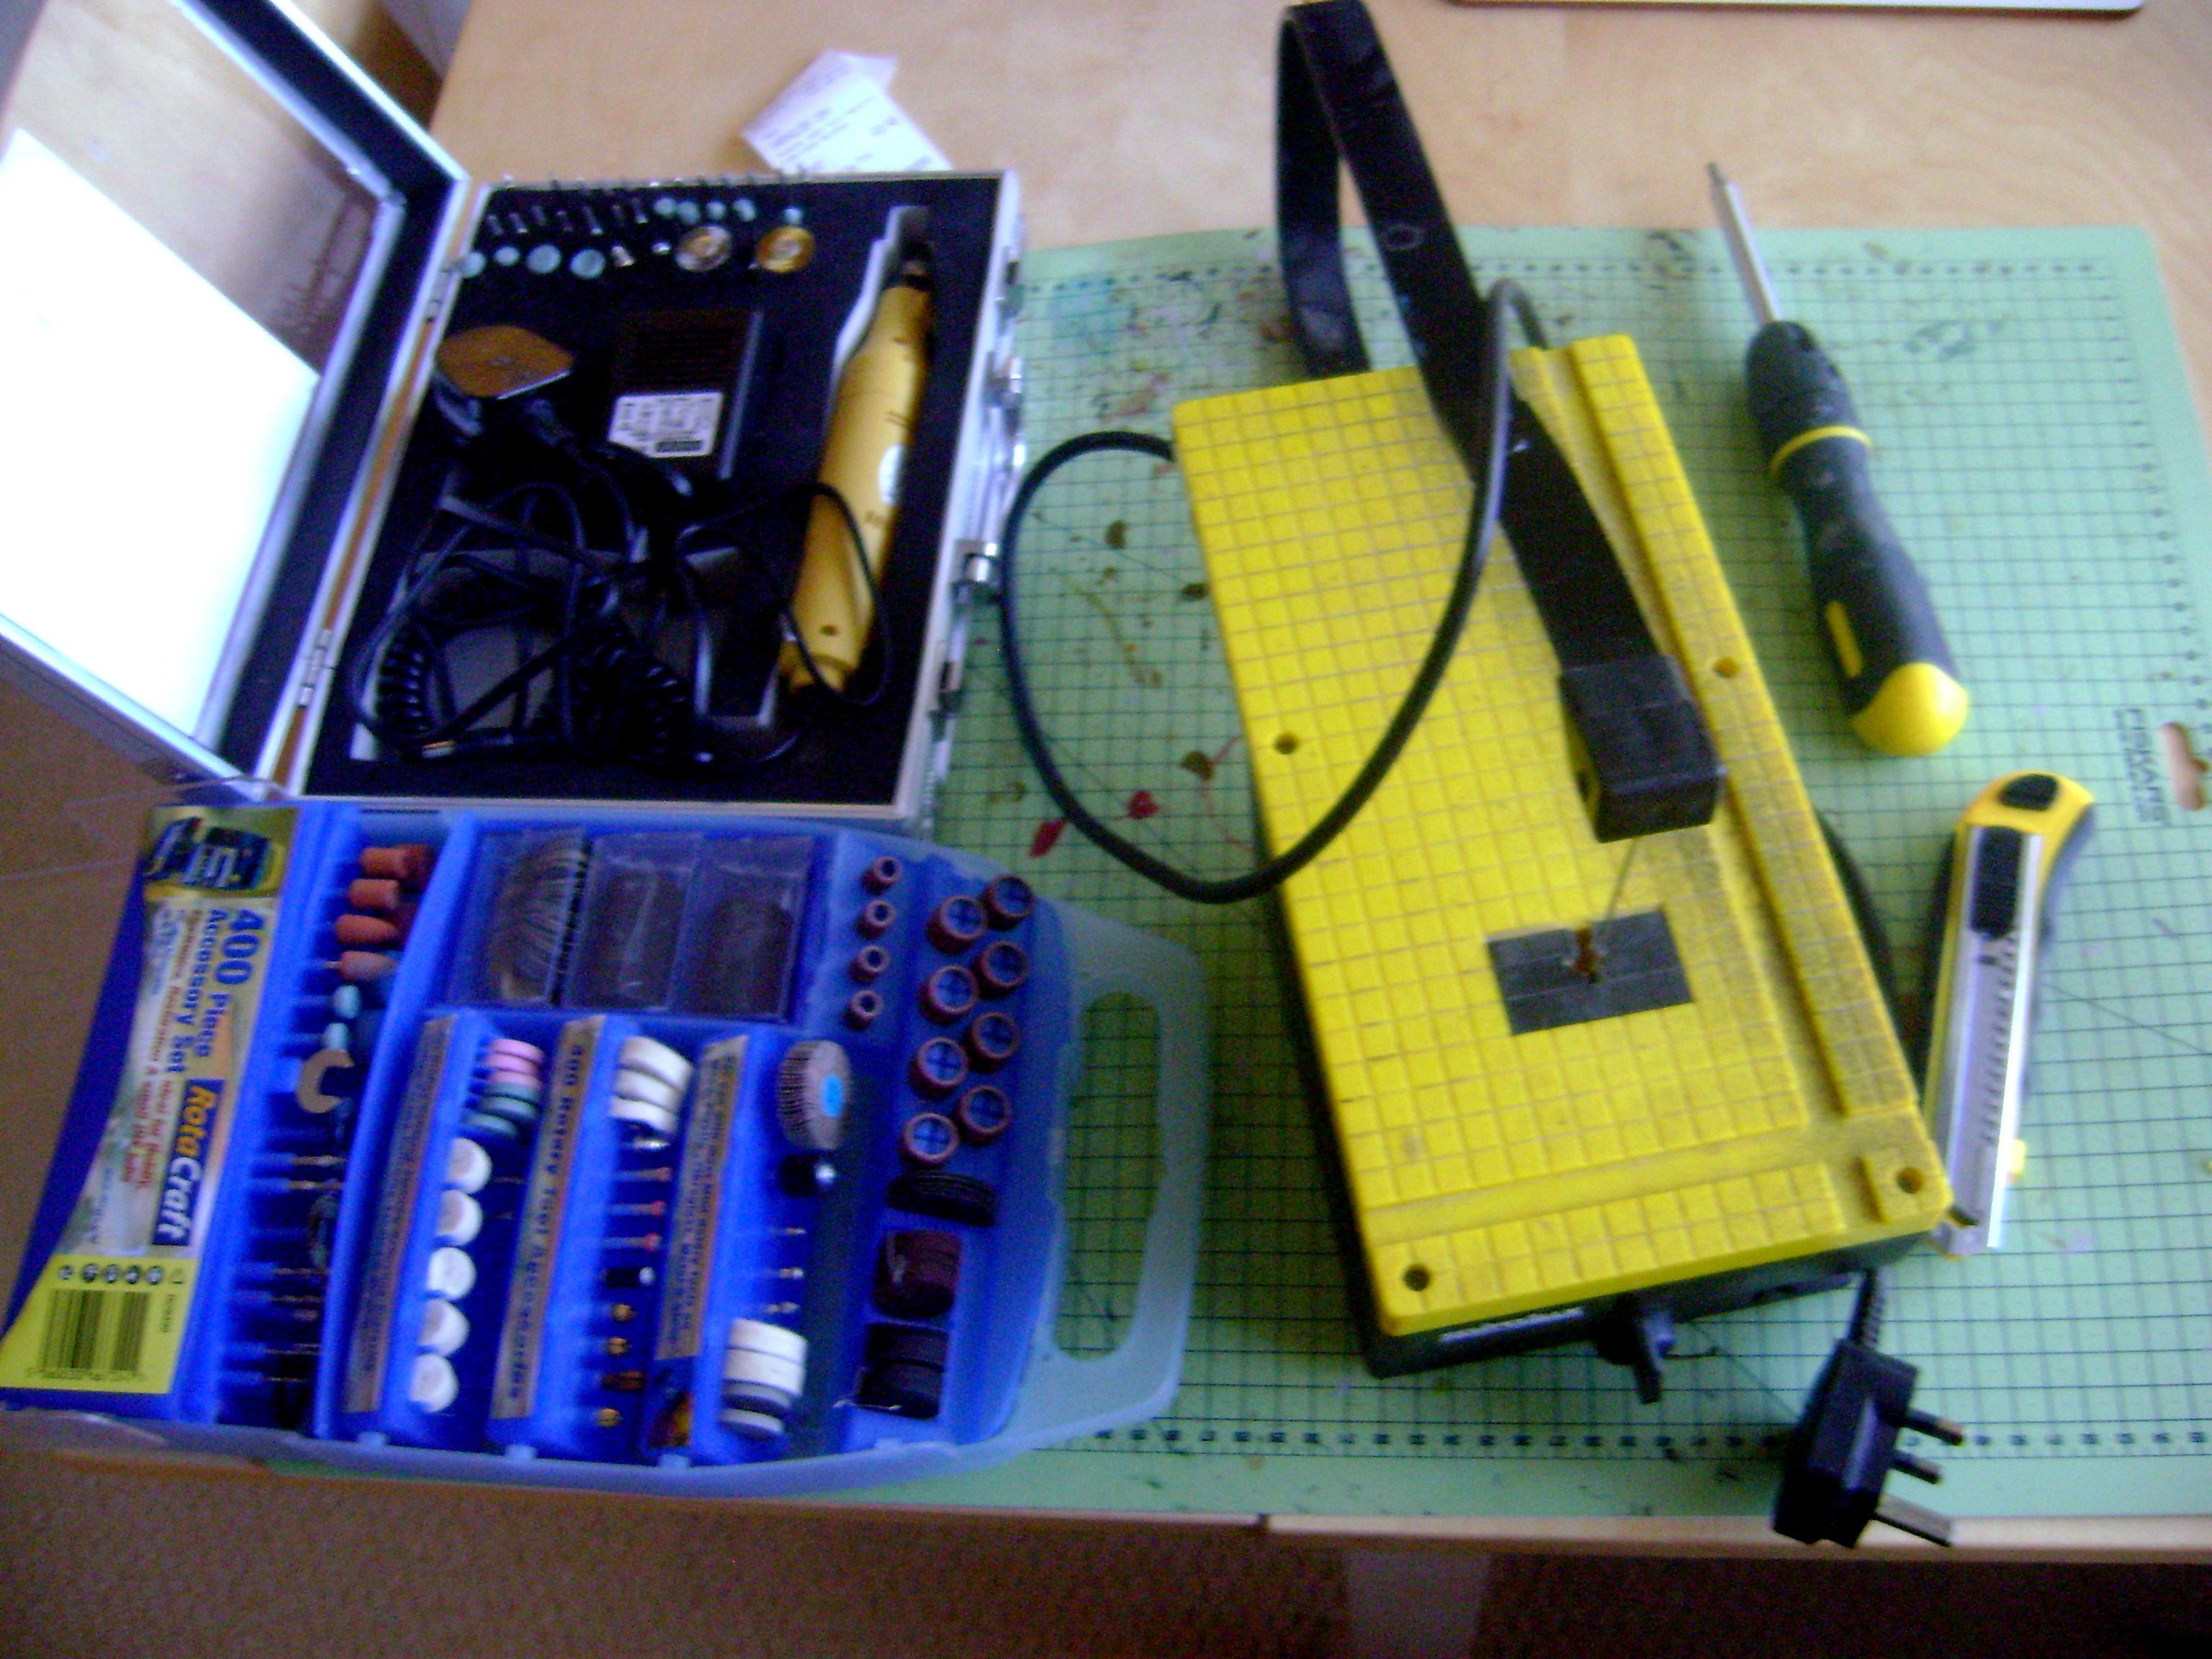 My Advanced tool kit